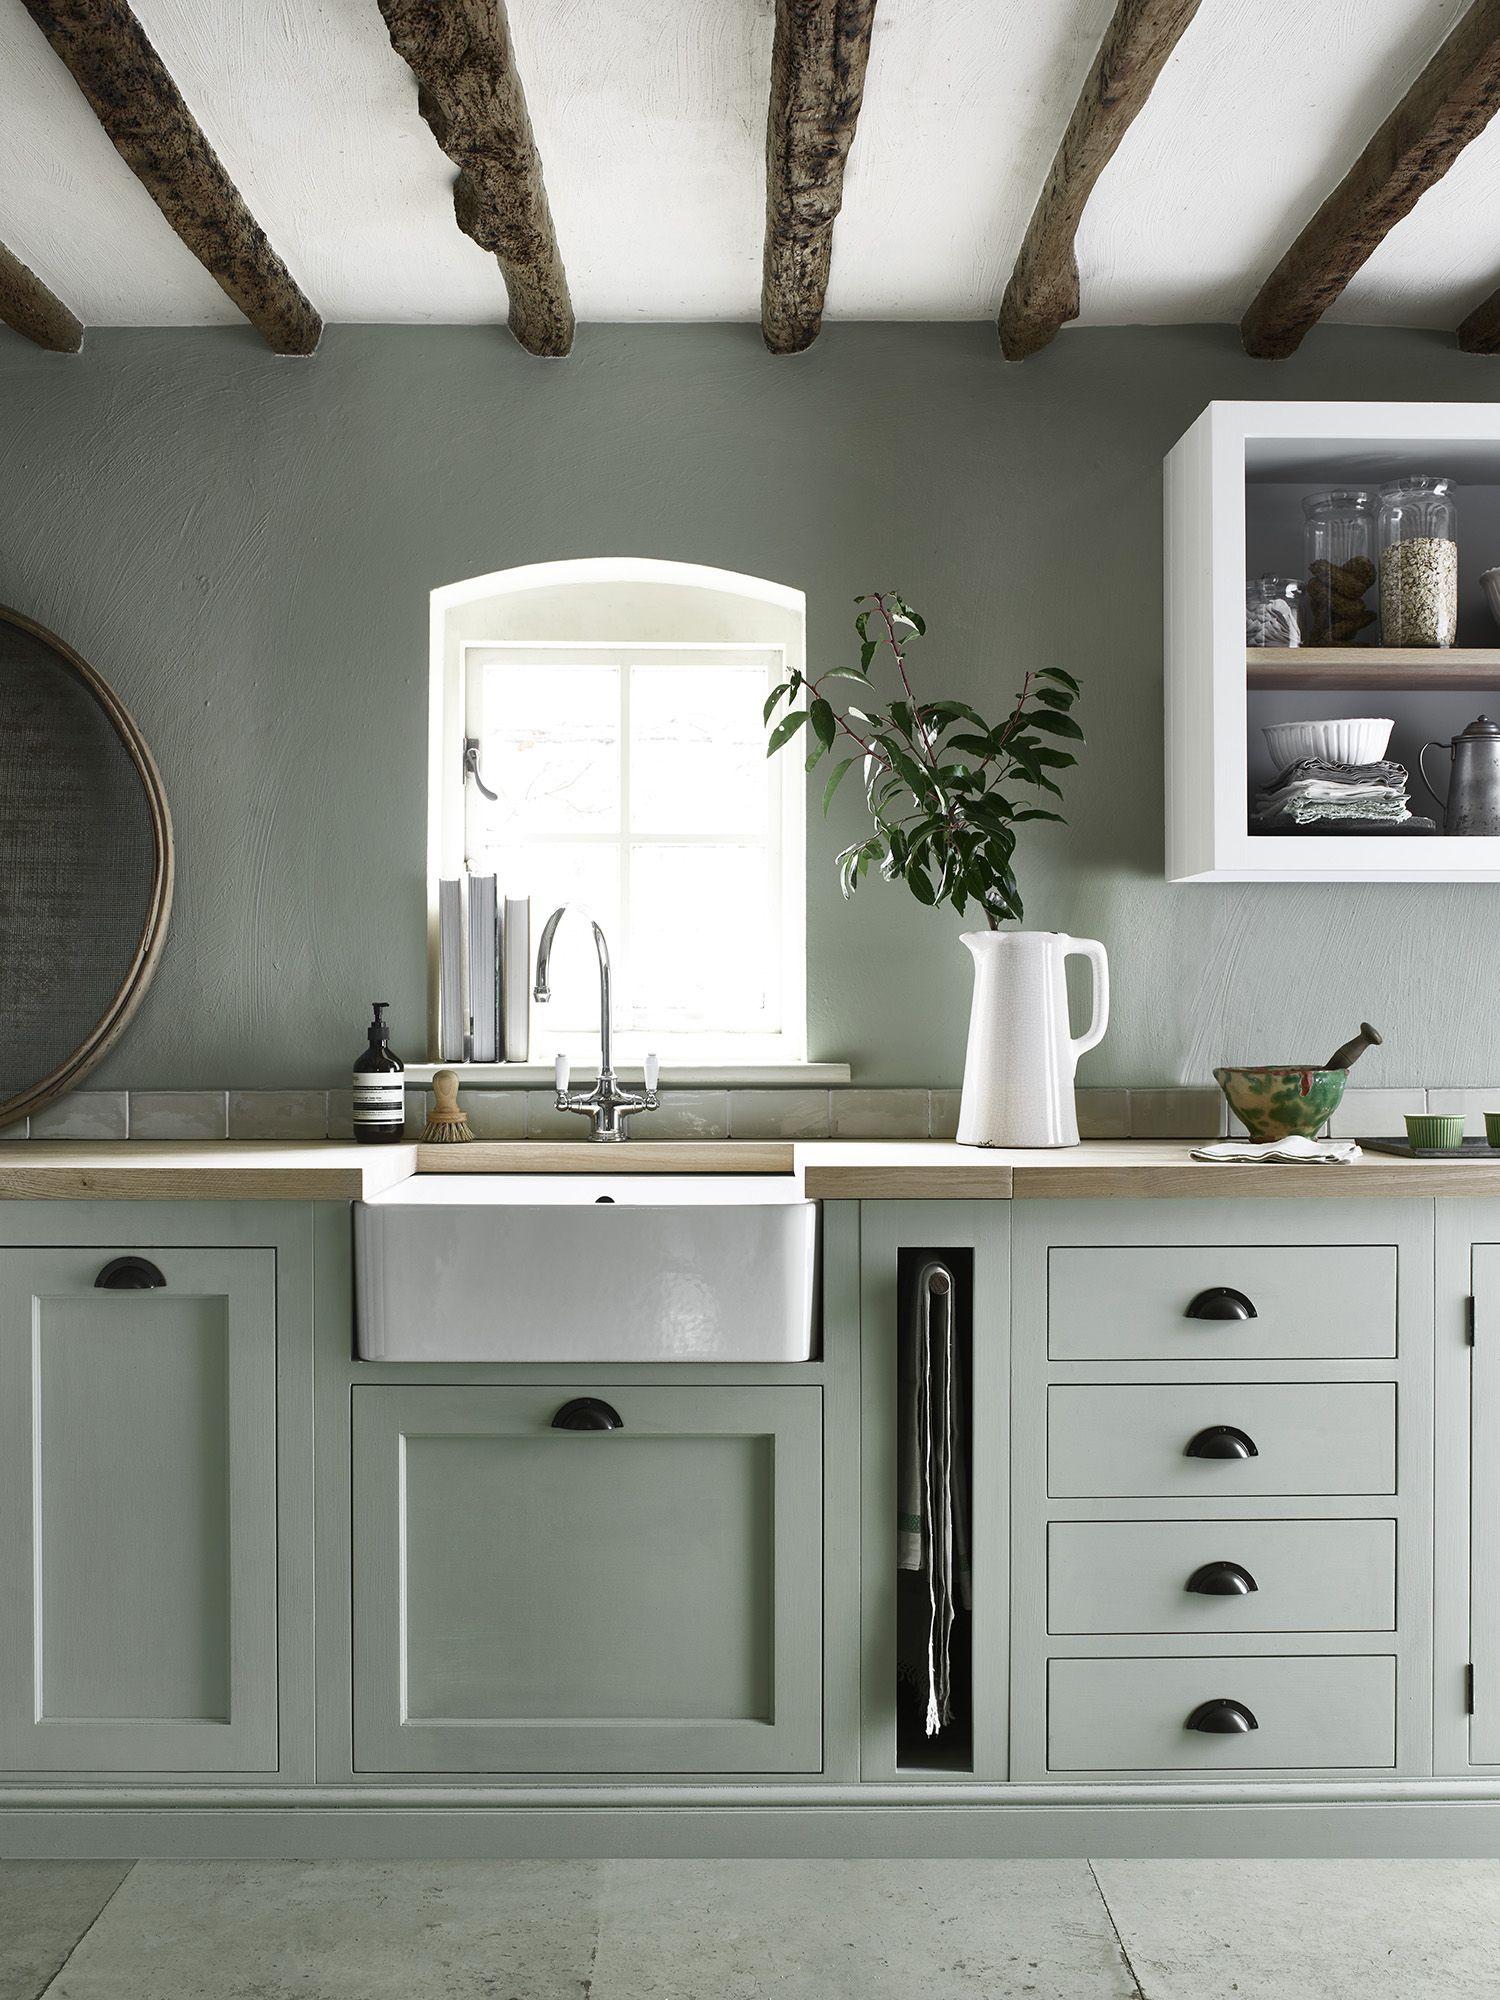 Henley kitchen handpainted in sage vance pinterest henleys